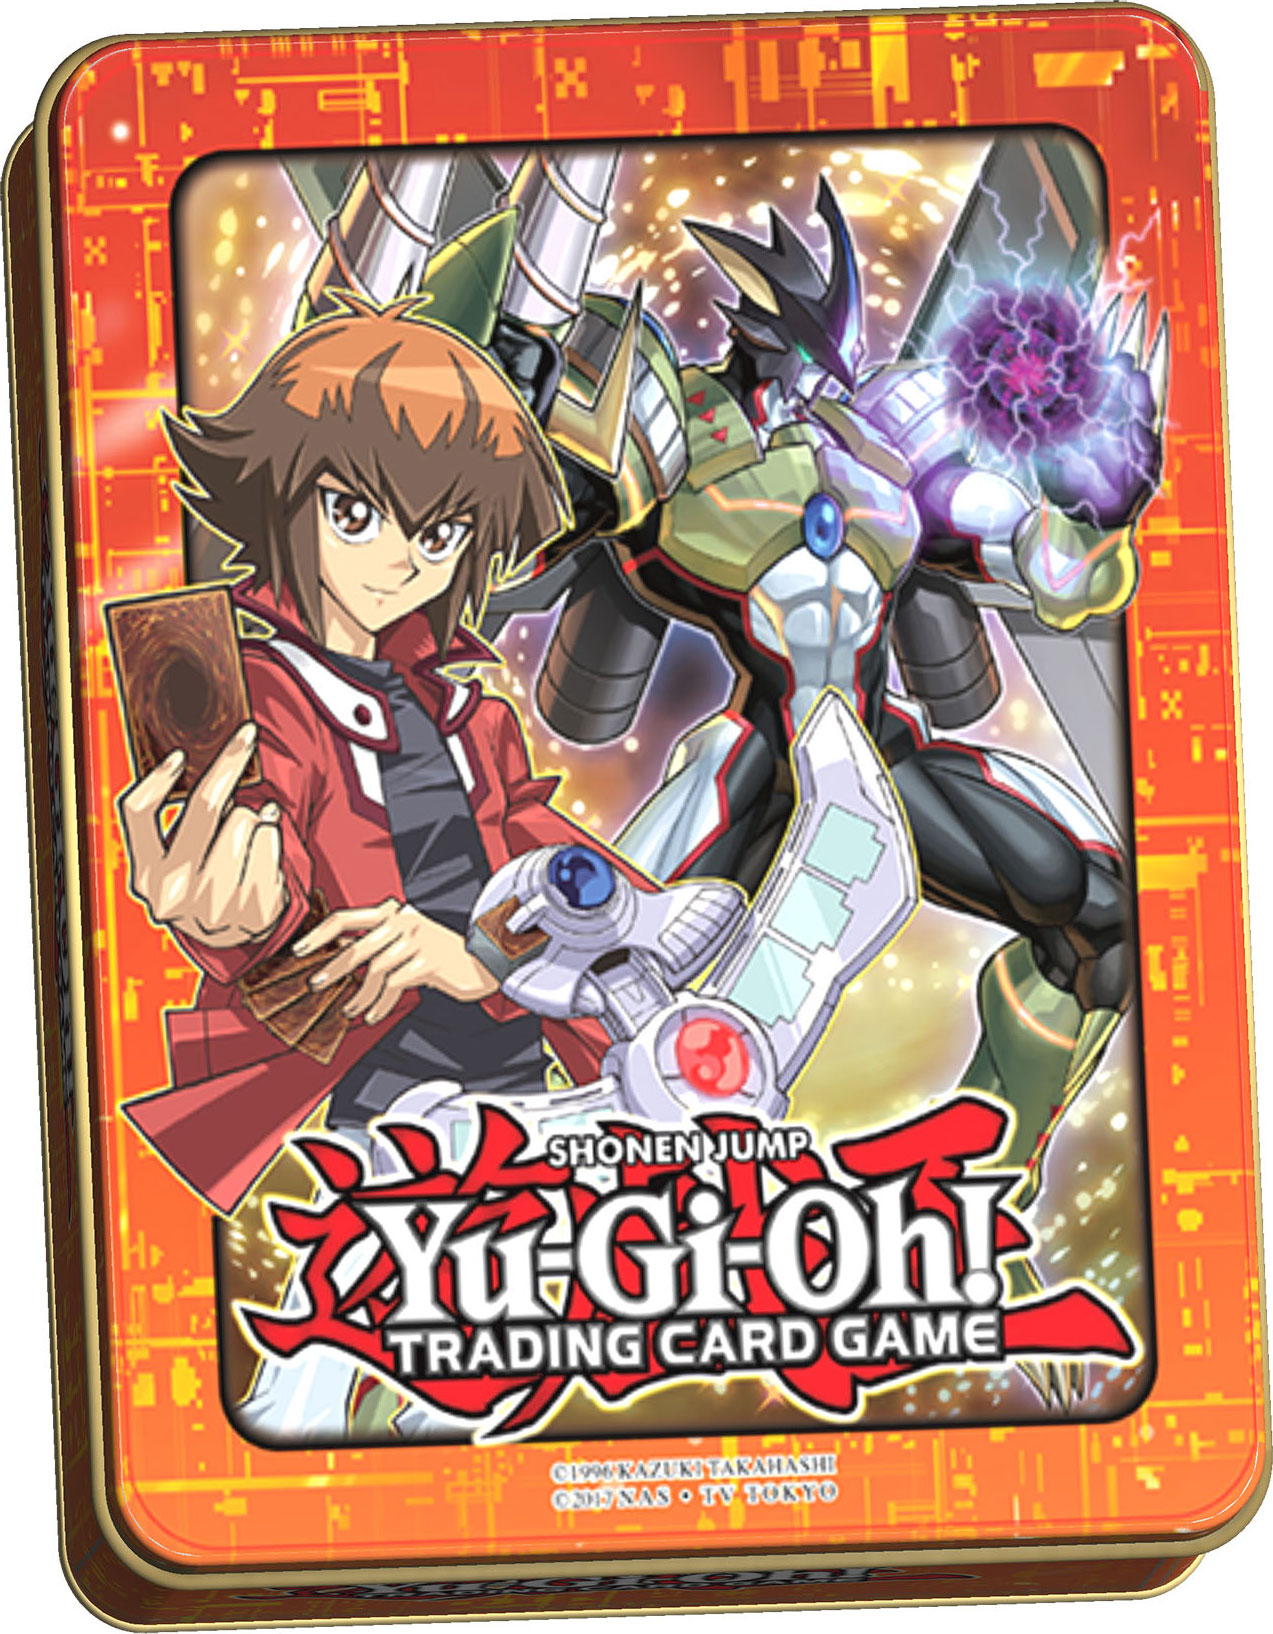 Yugioh Mega Tin 2020 Card List.Yu Gi Oh Tcg 2018 Mega Tins Announced Yugioh World